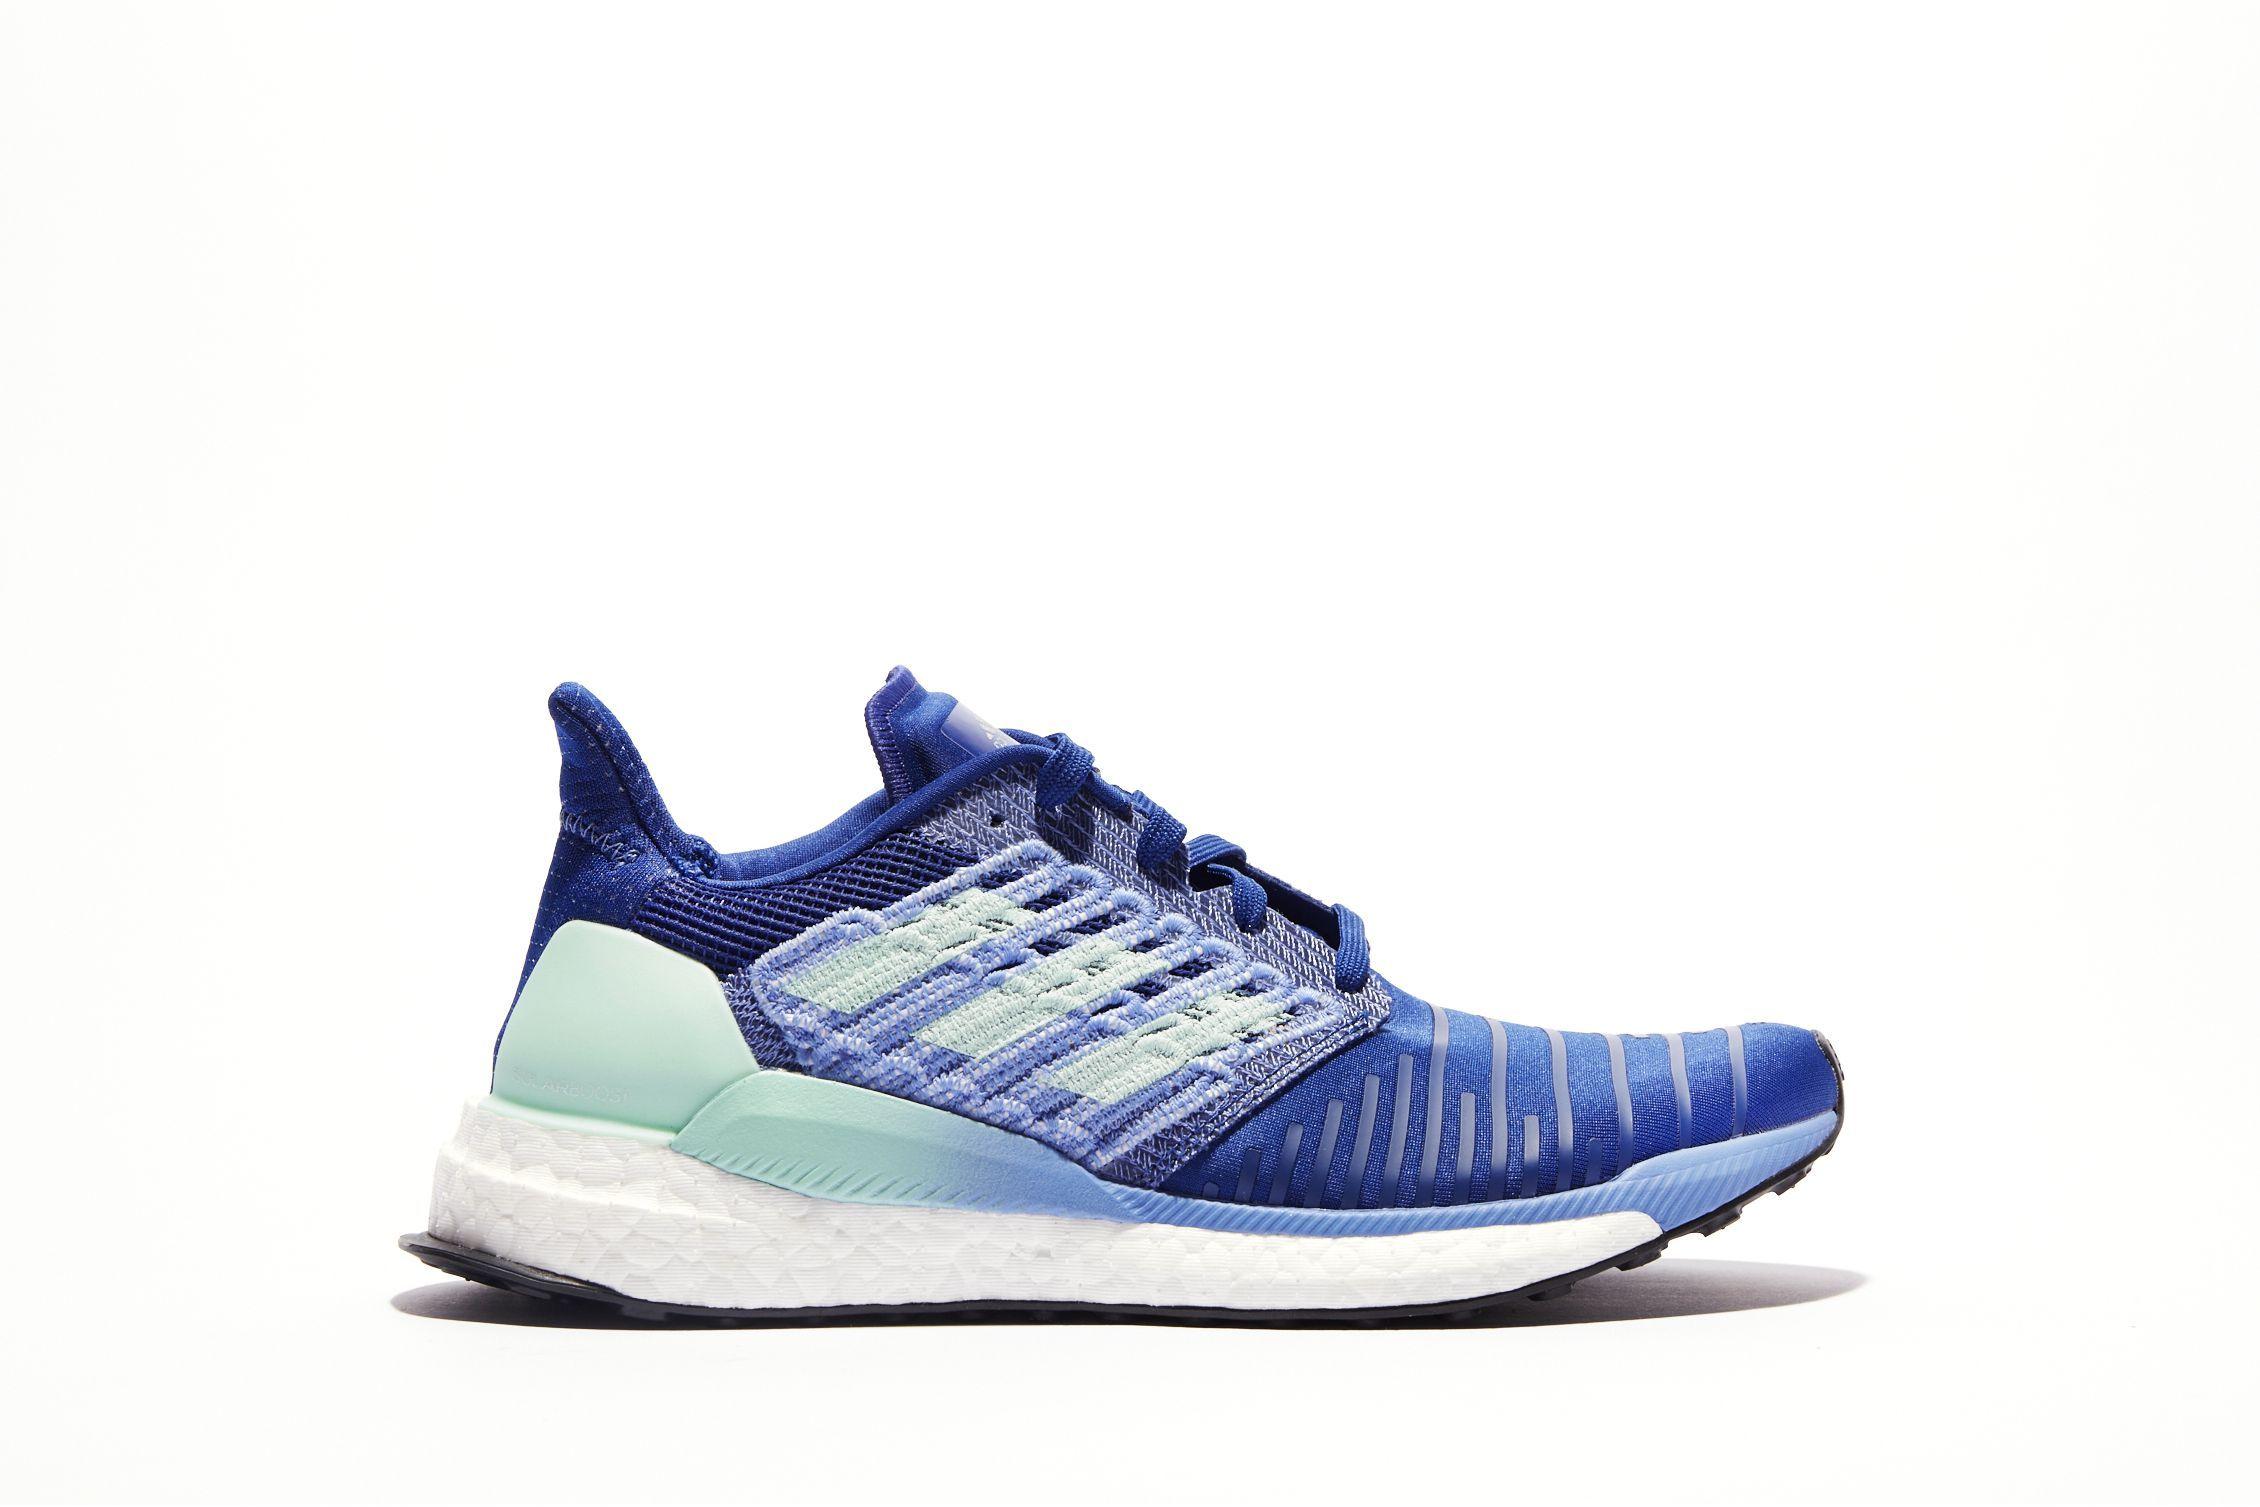 Best Running Shoes for Women | Women's Running Shoes 2019